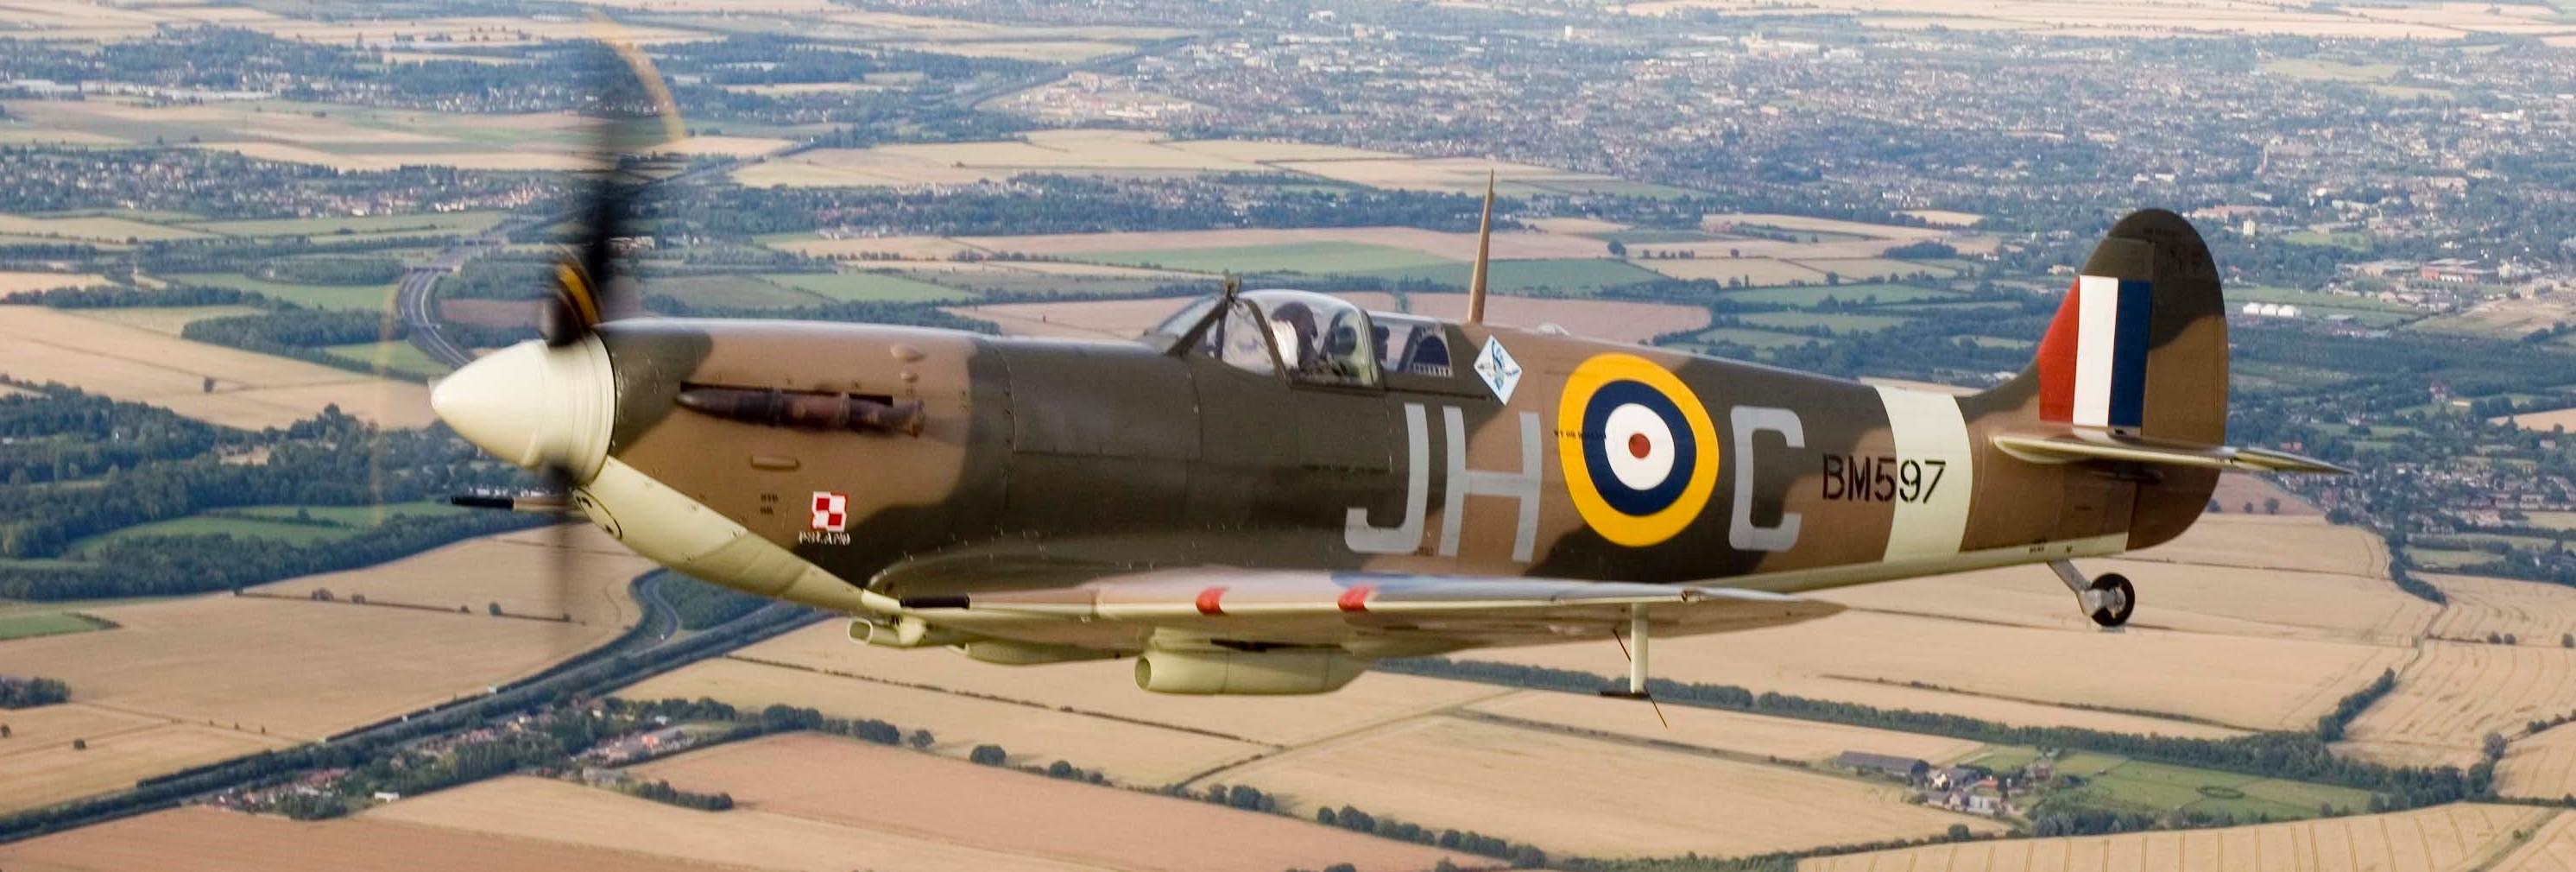 Spitfire 85th anniversary of first flight